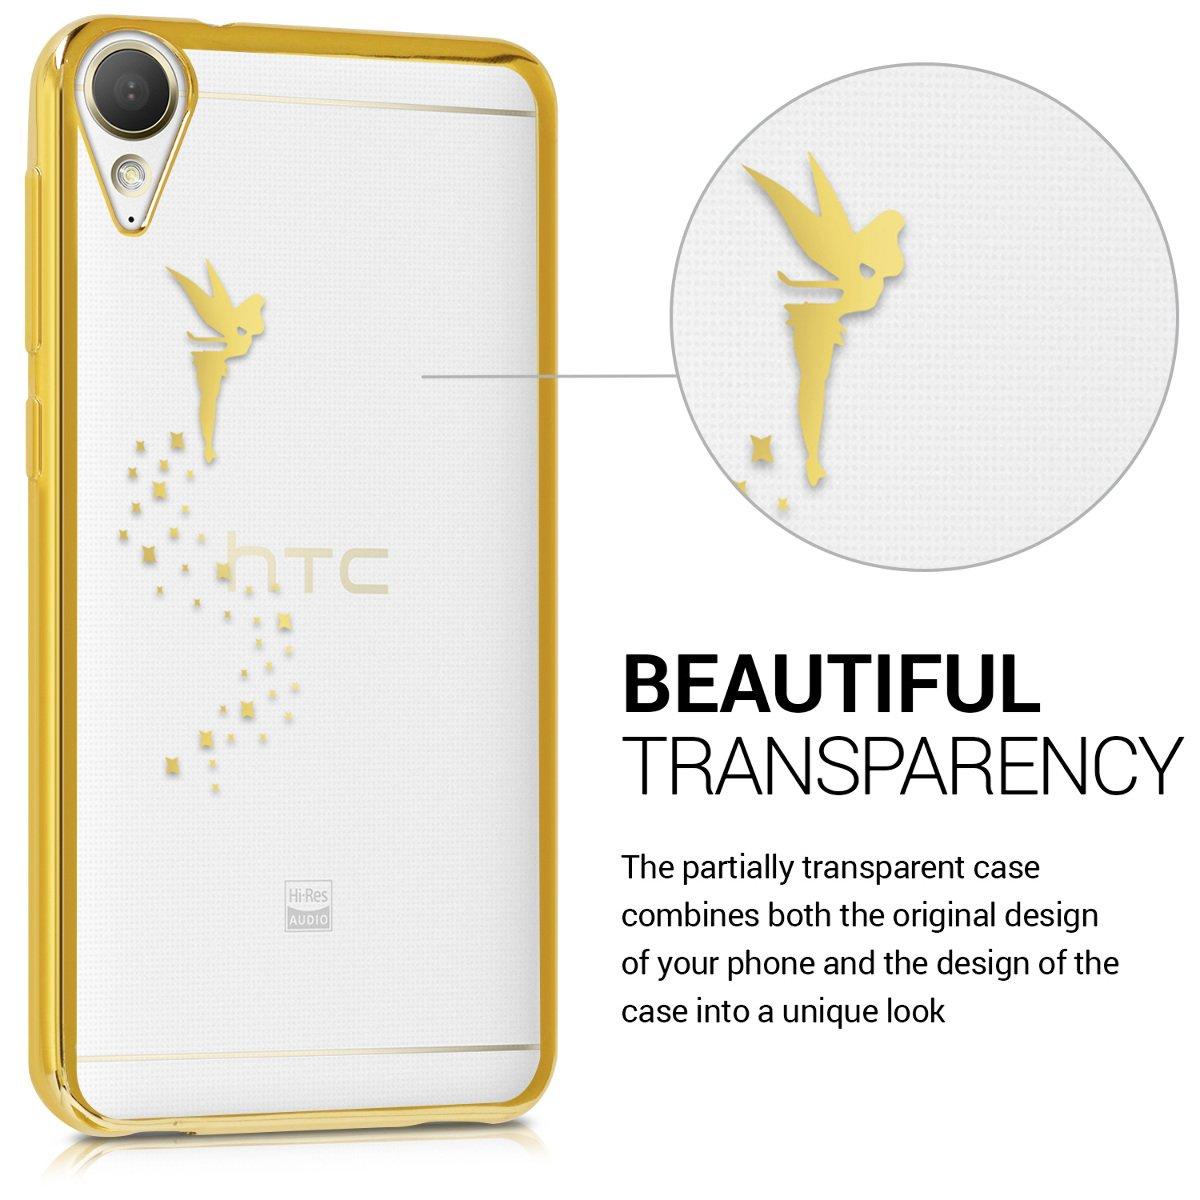 b9385837db6 kwmobile Funda para HTC Desire 10 Lifestyle - Carcasa [Trasera] de [TPU]  con diseño de Hada en [Dorado/Transparente]: Amazon.com.mx: Electrónicos